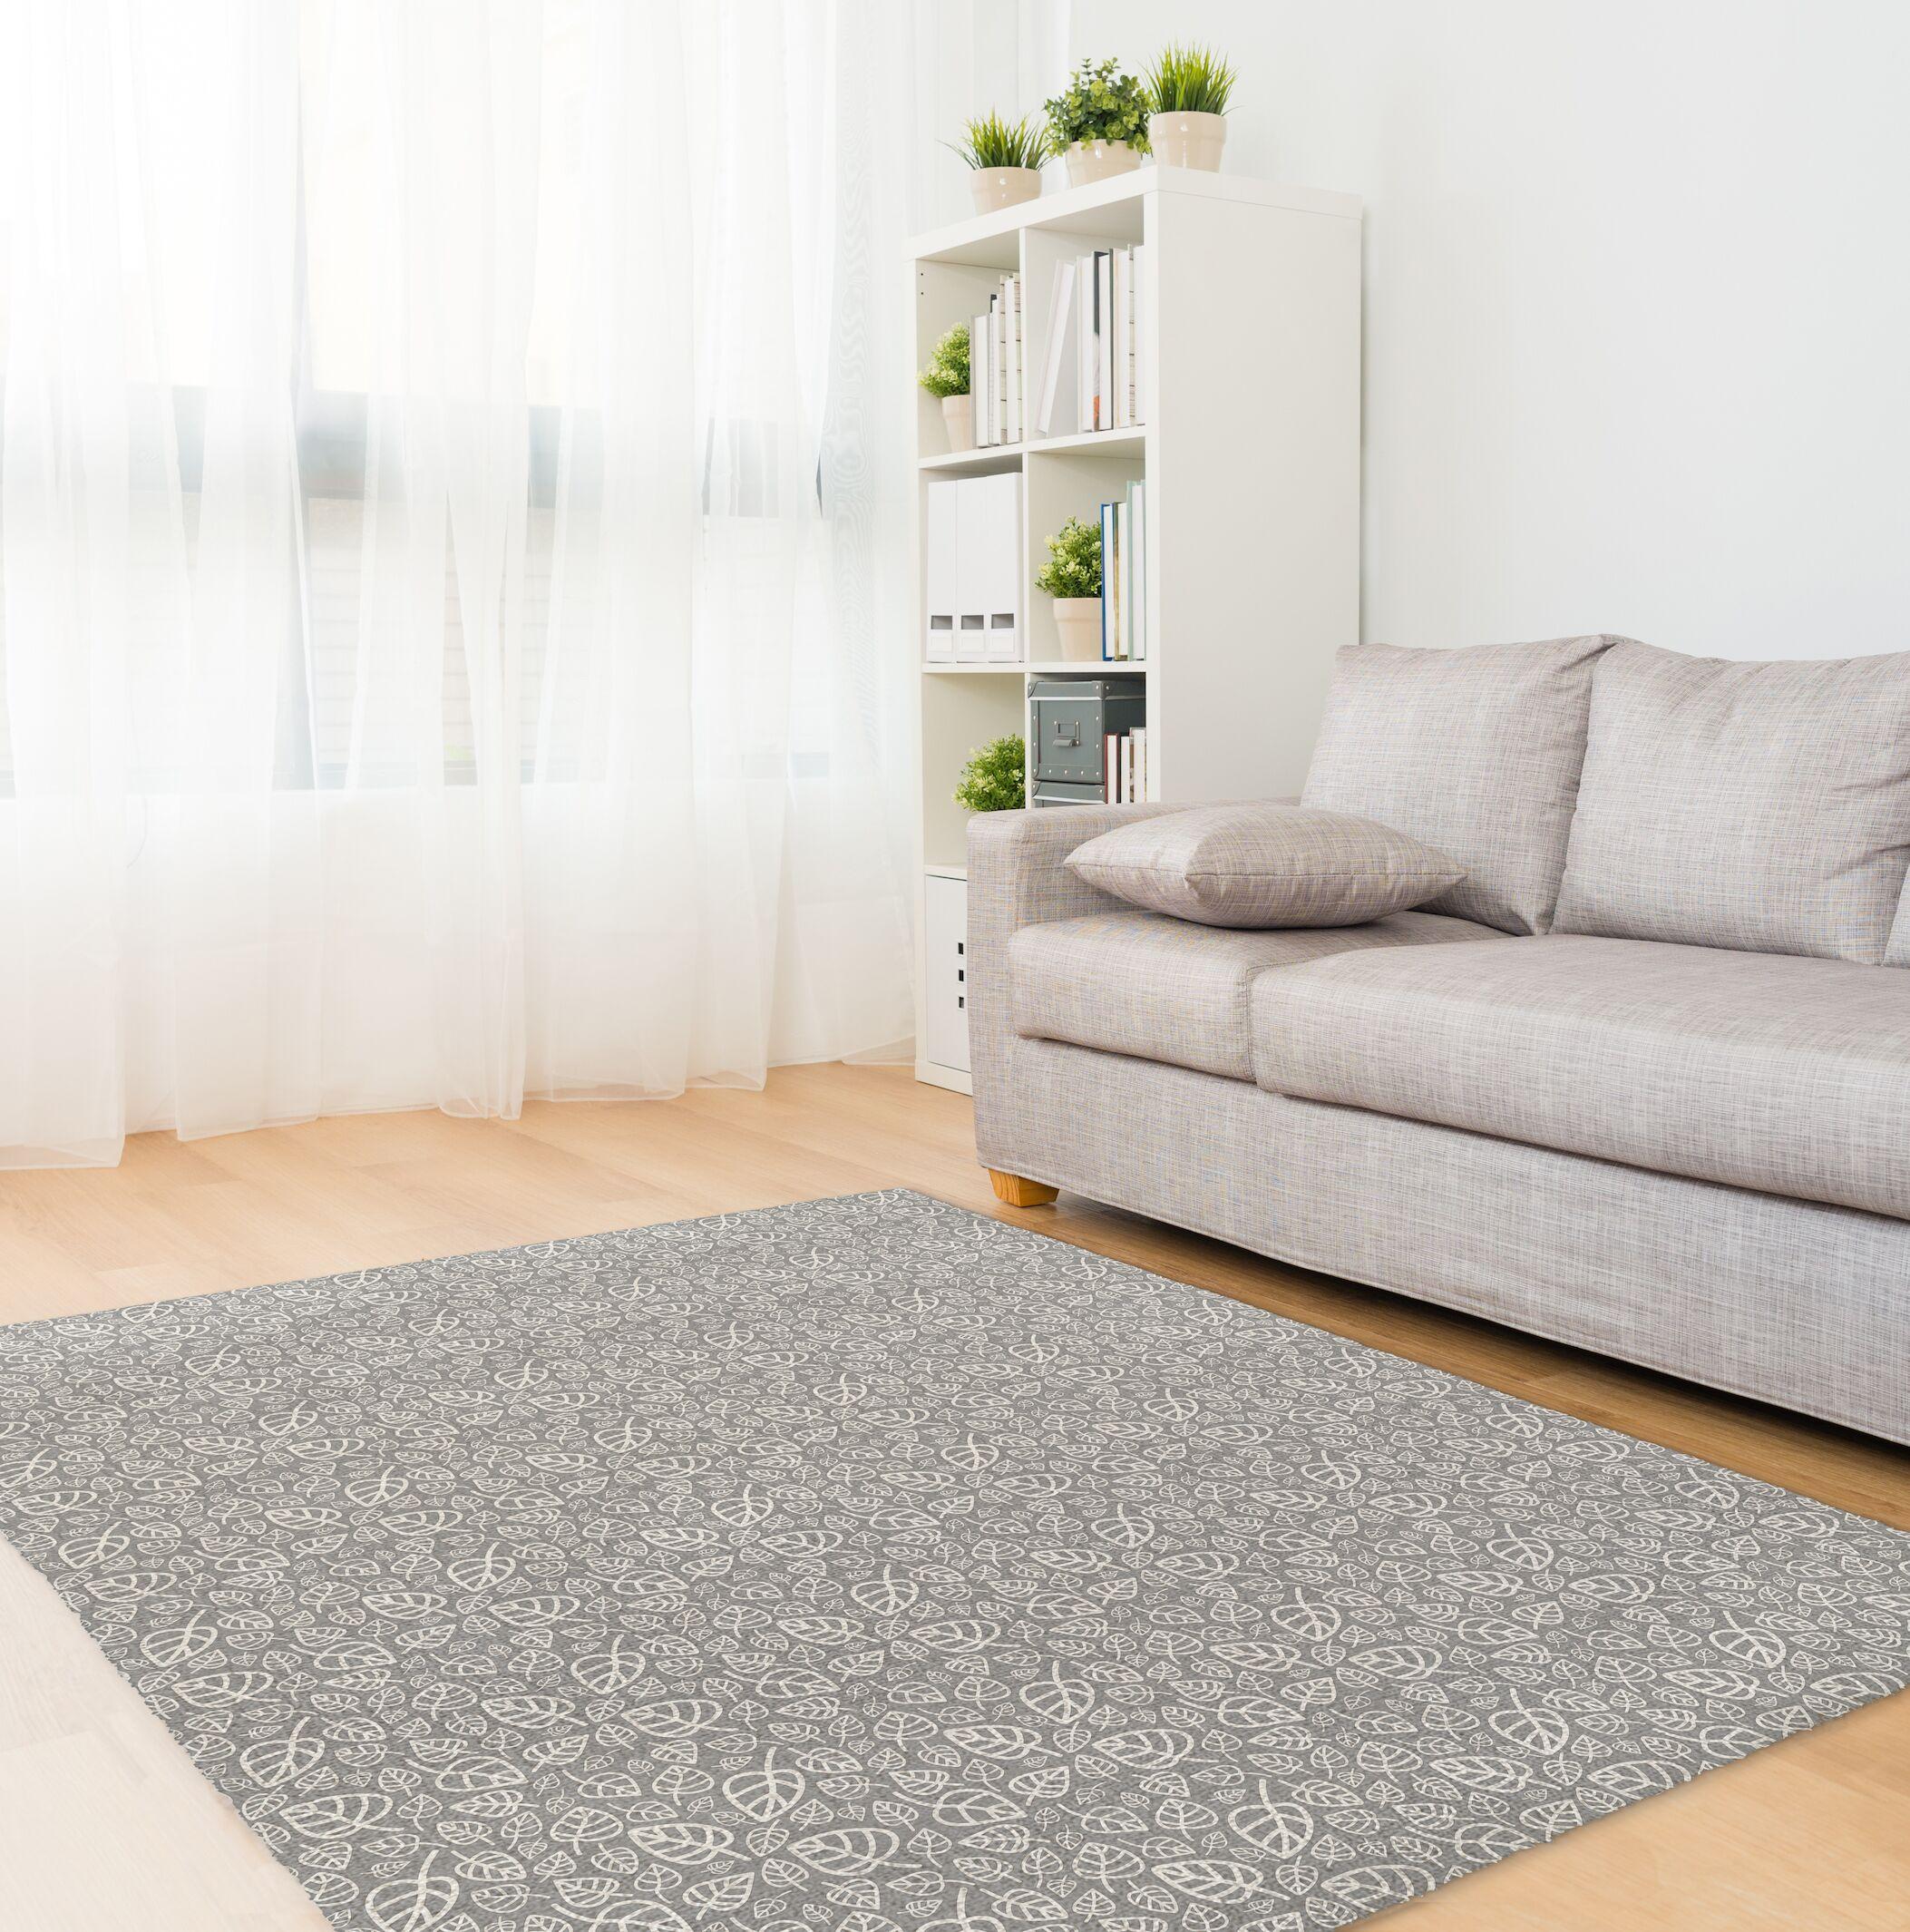 Decarlo Gray Area Rug Rug Size: Rectangle 5' x 7'